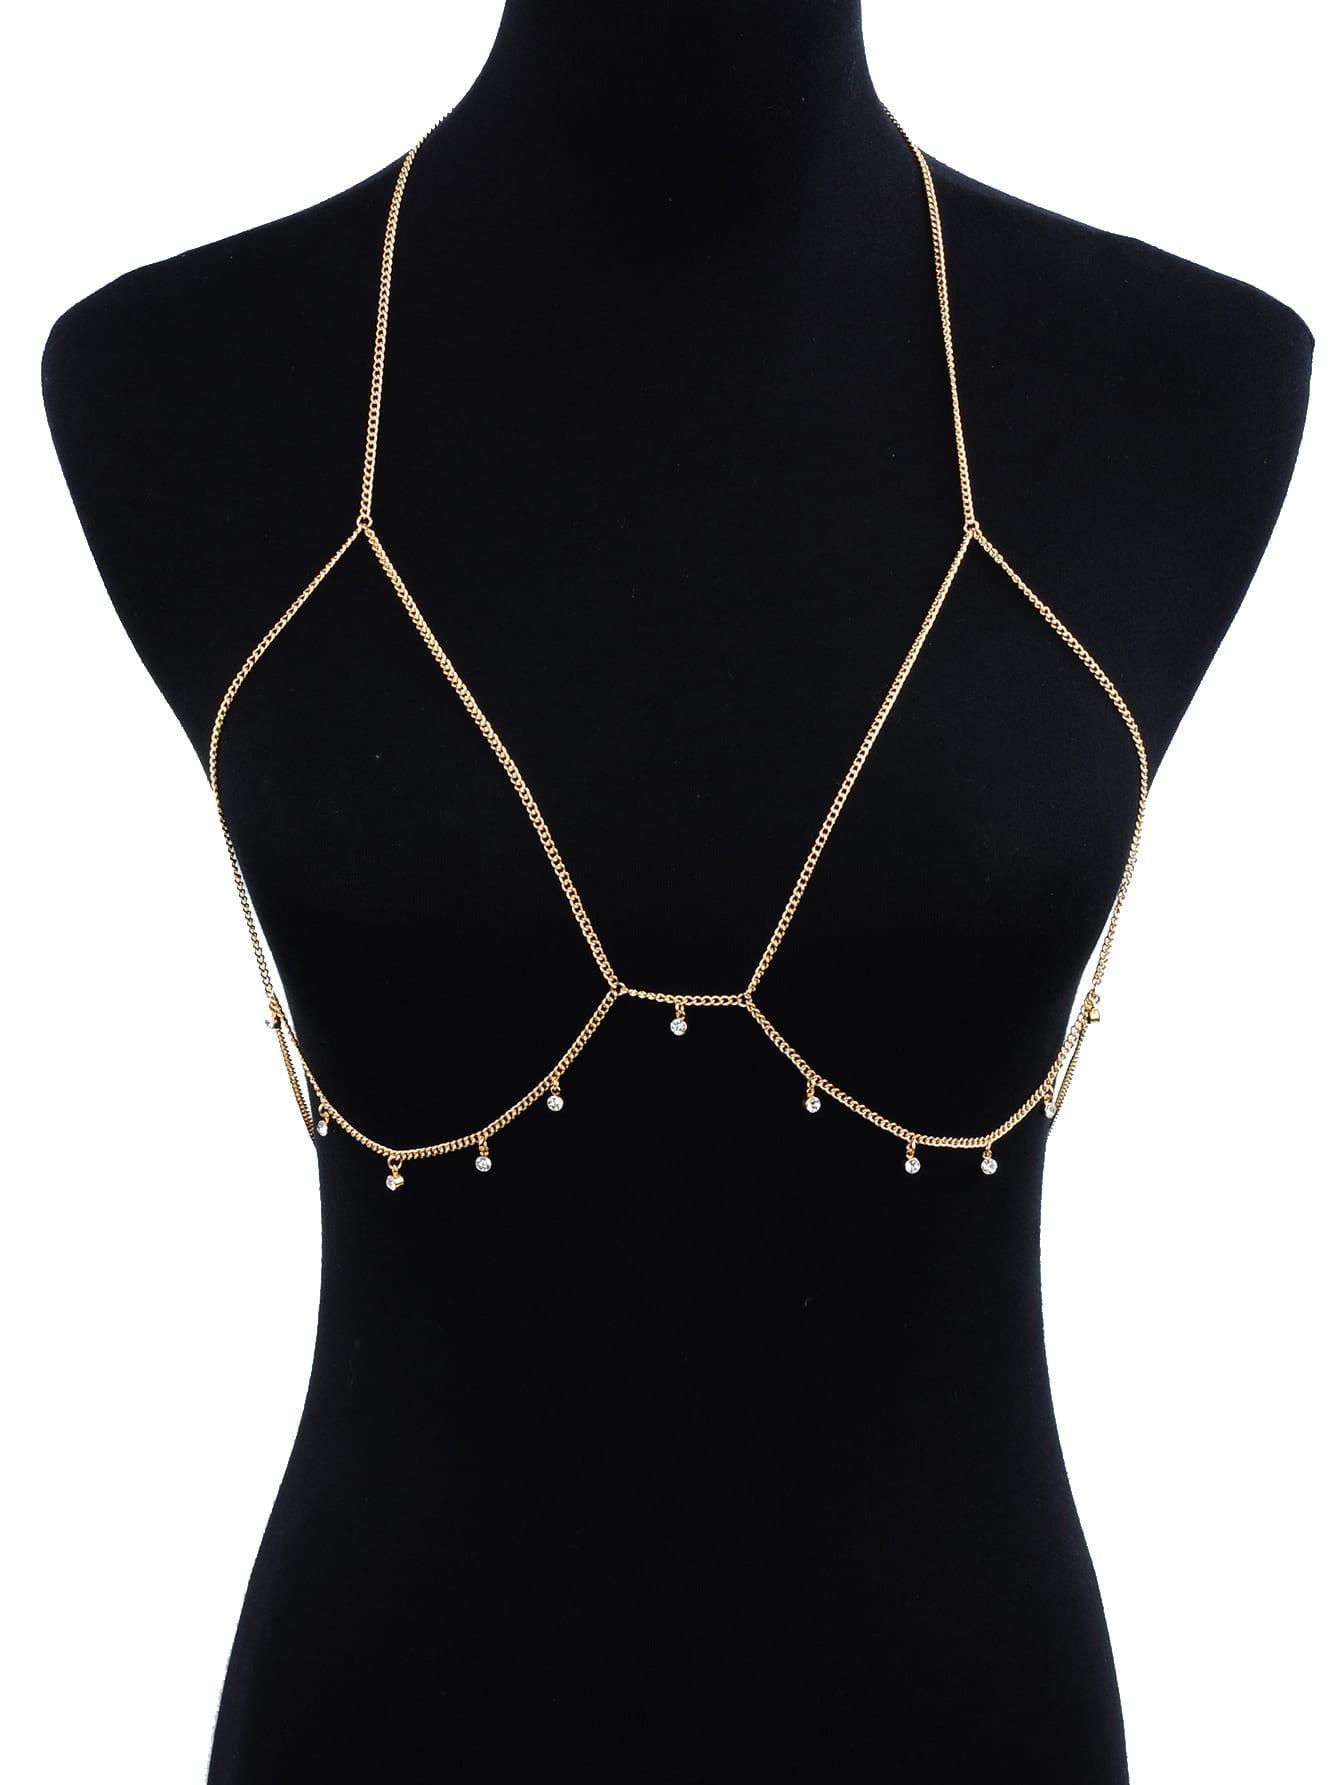 Rhinestone Detail Bralet Body Chain